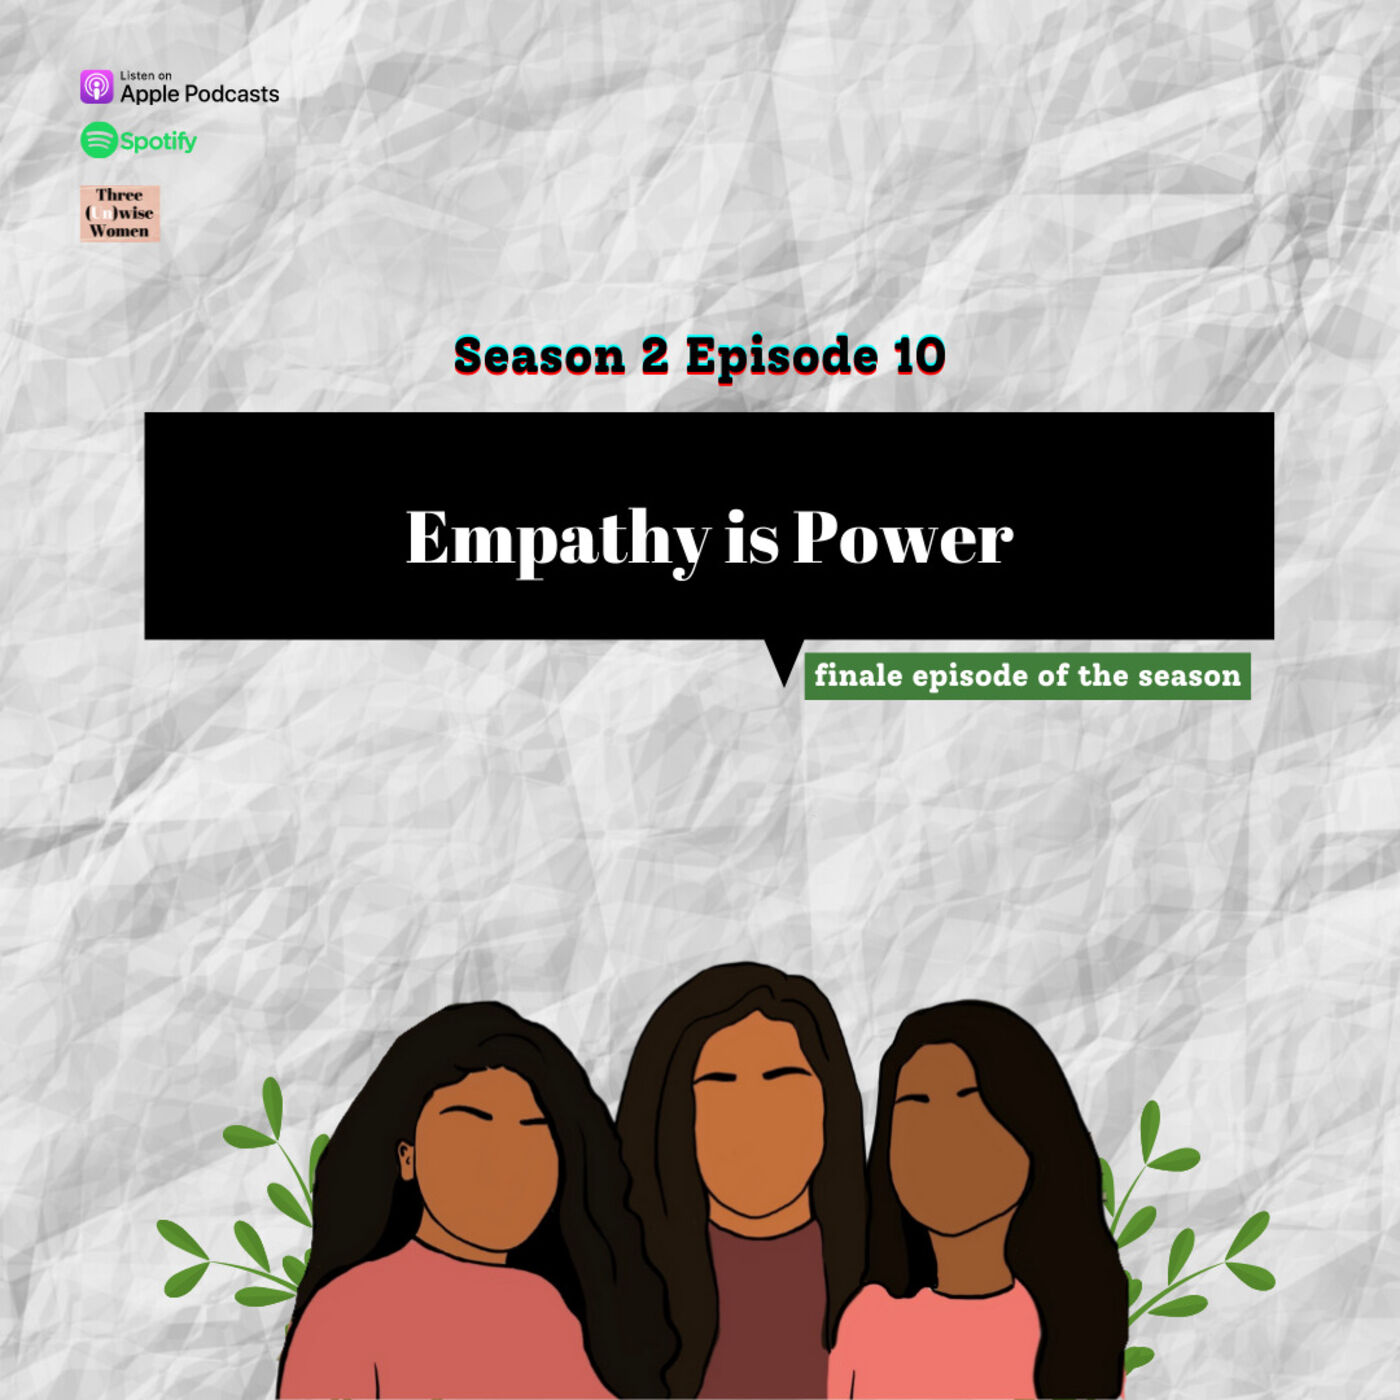 Empathy is Power